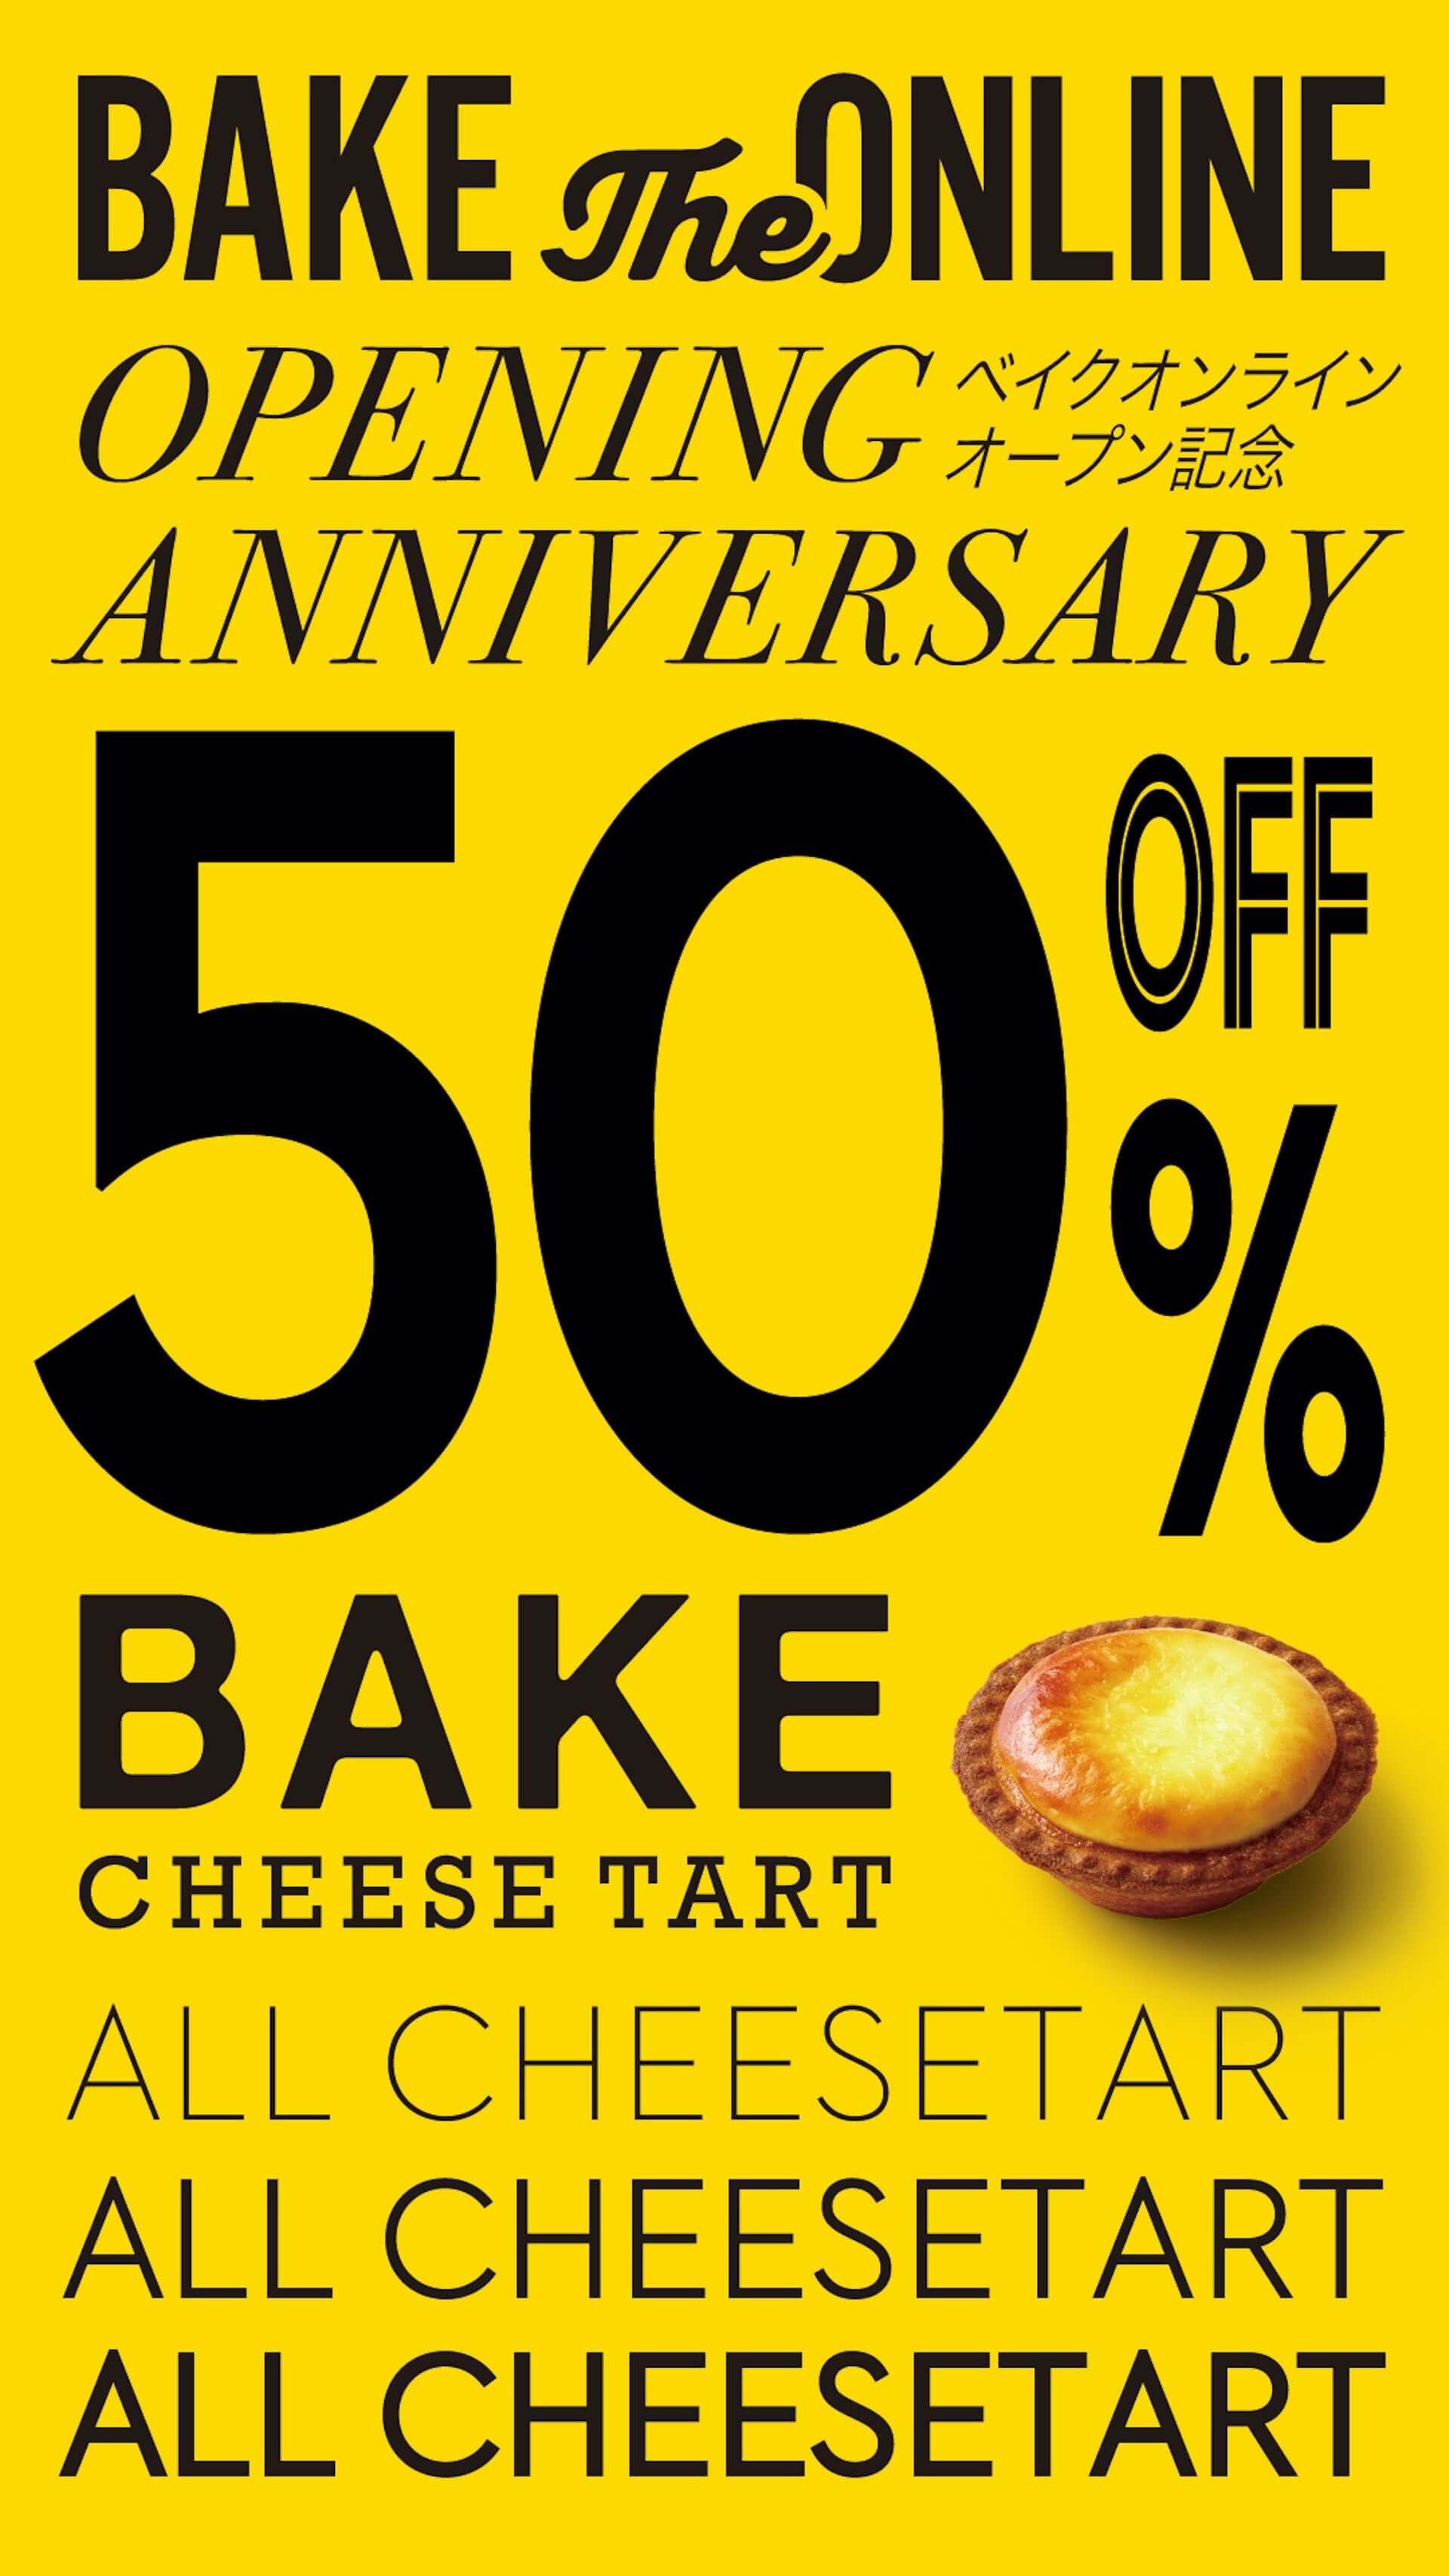 BAKE初の公式オンラインショップ「BAKE THE ONLINE」がオープン!チーズタルト10P BOXが50%OFFの特別価格に gourmet_bake_online_07-1920x3413